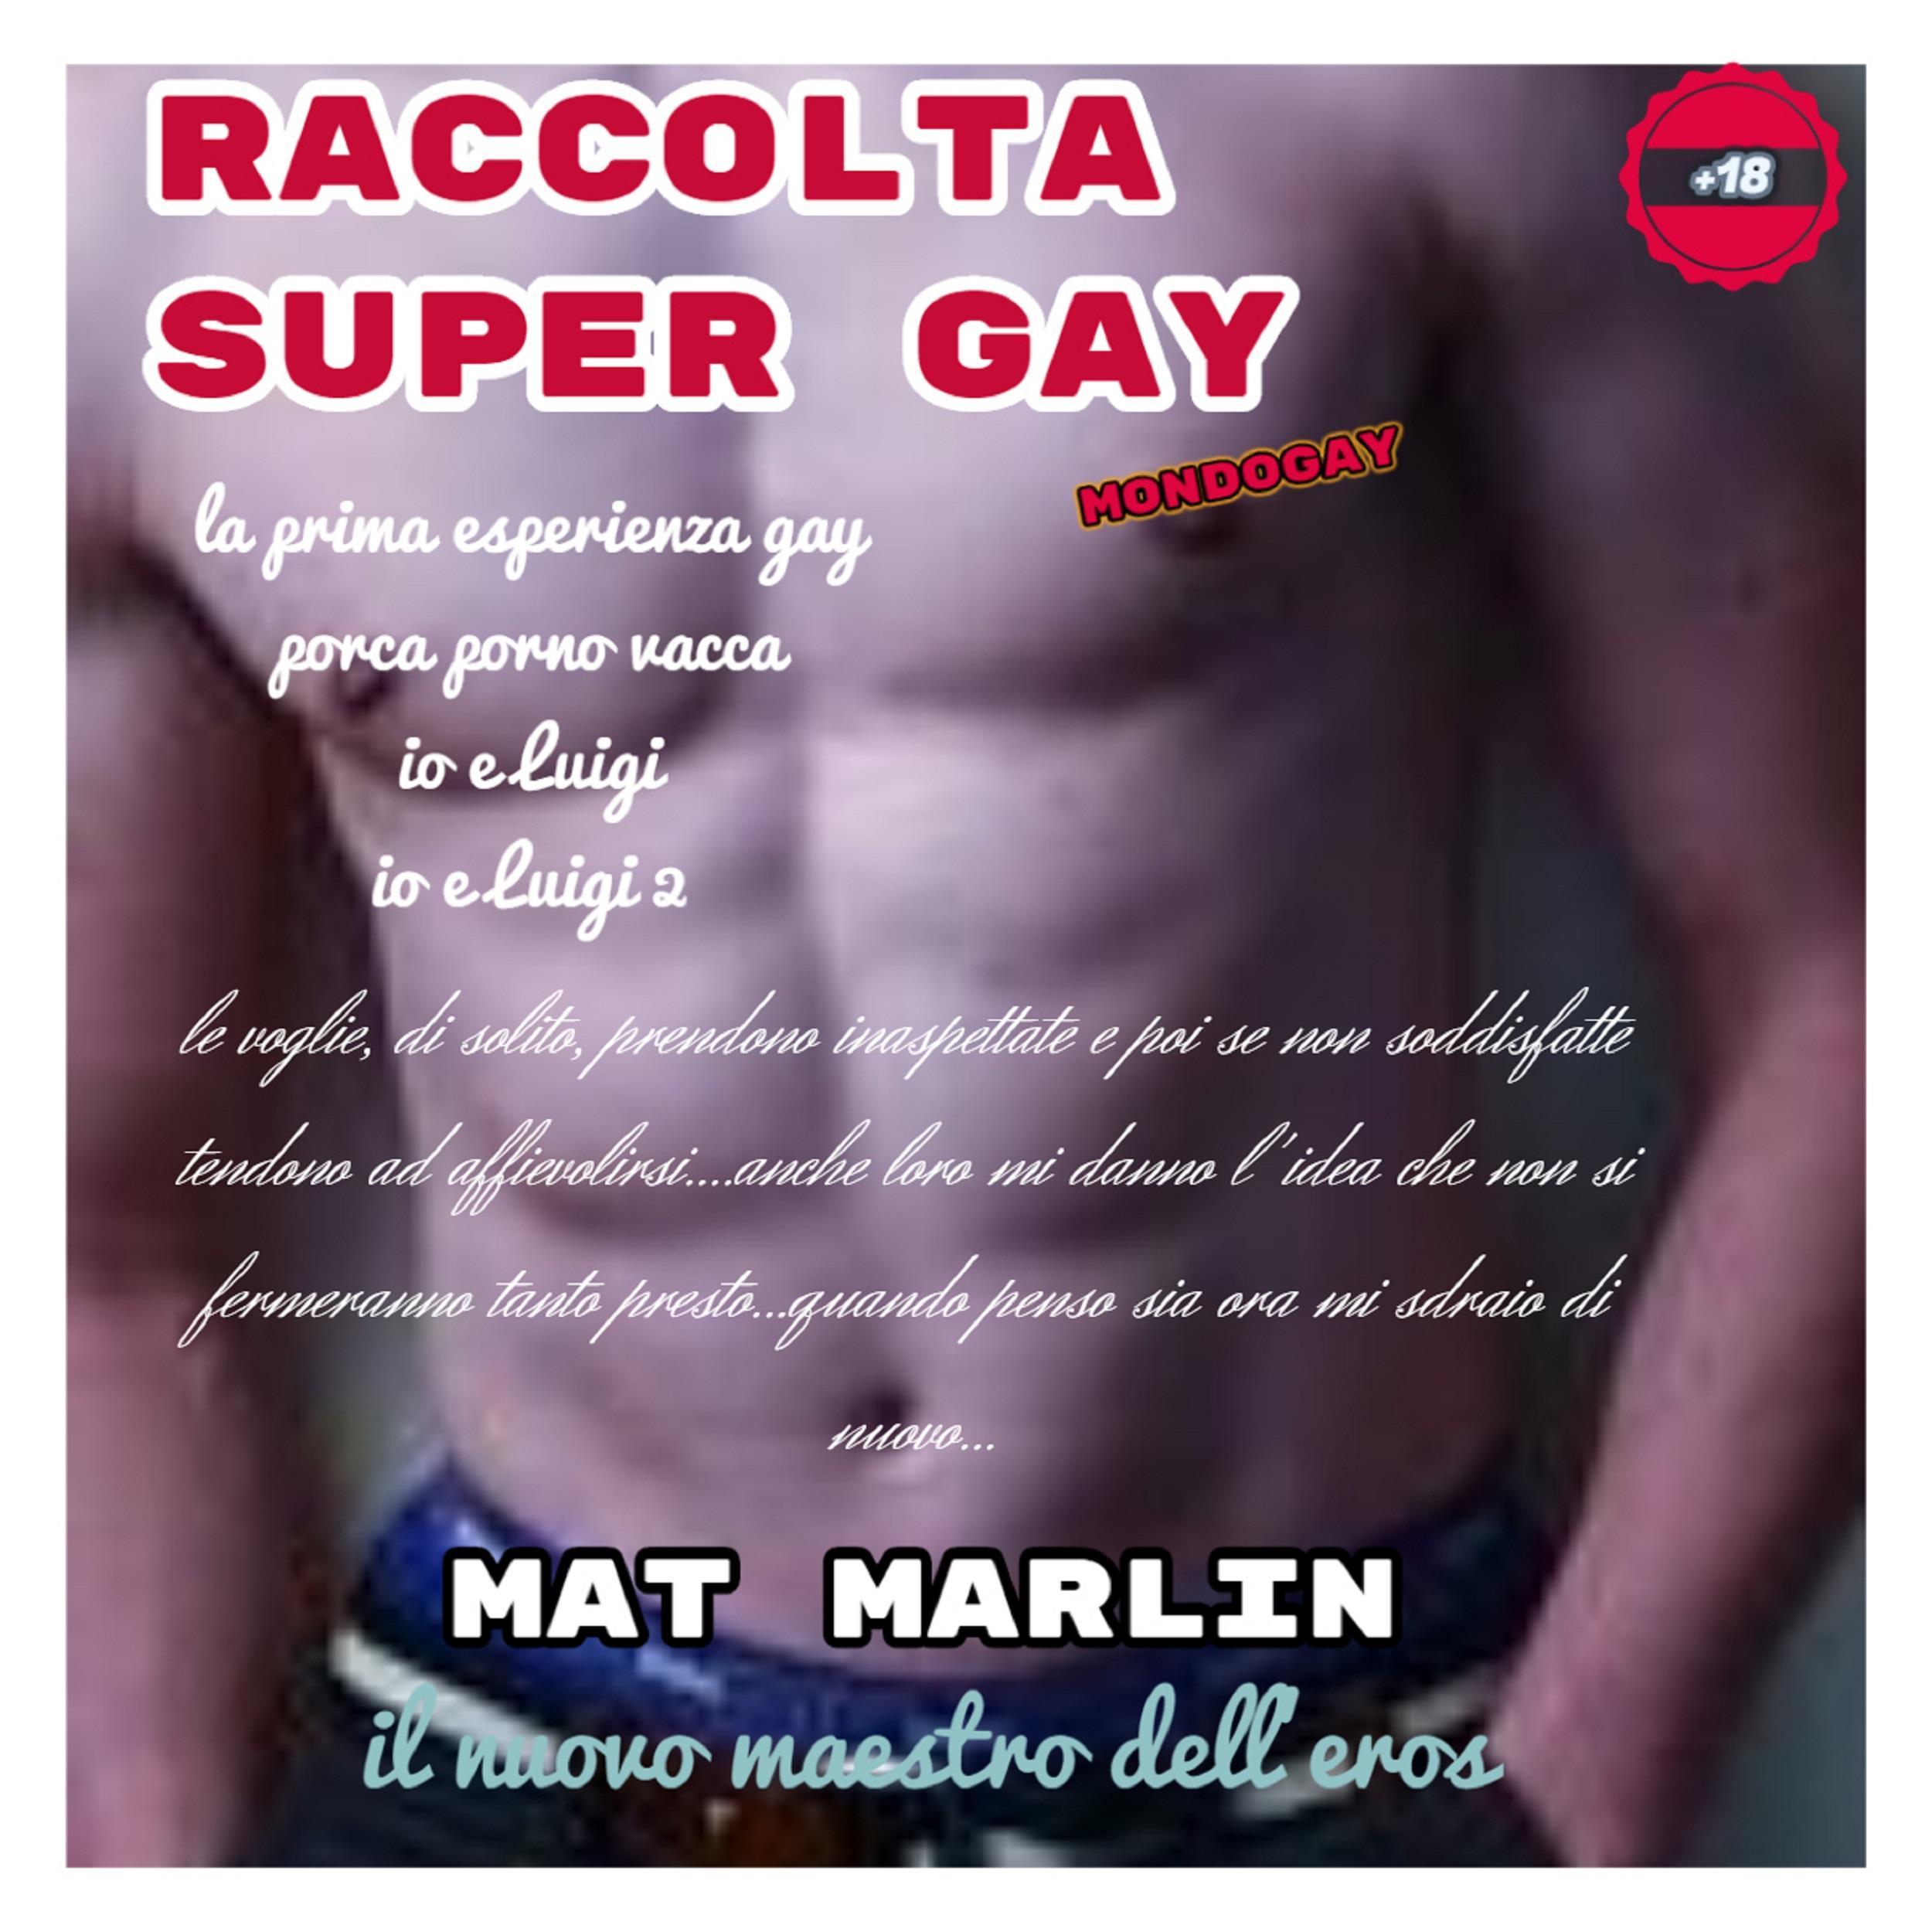 Raccolta Super Gay [Mat Marlin]